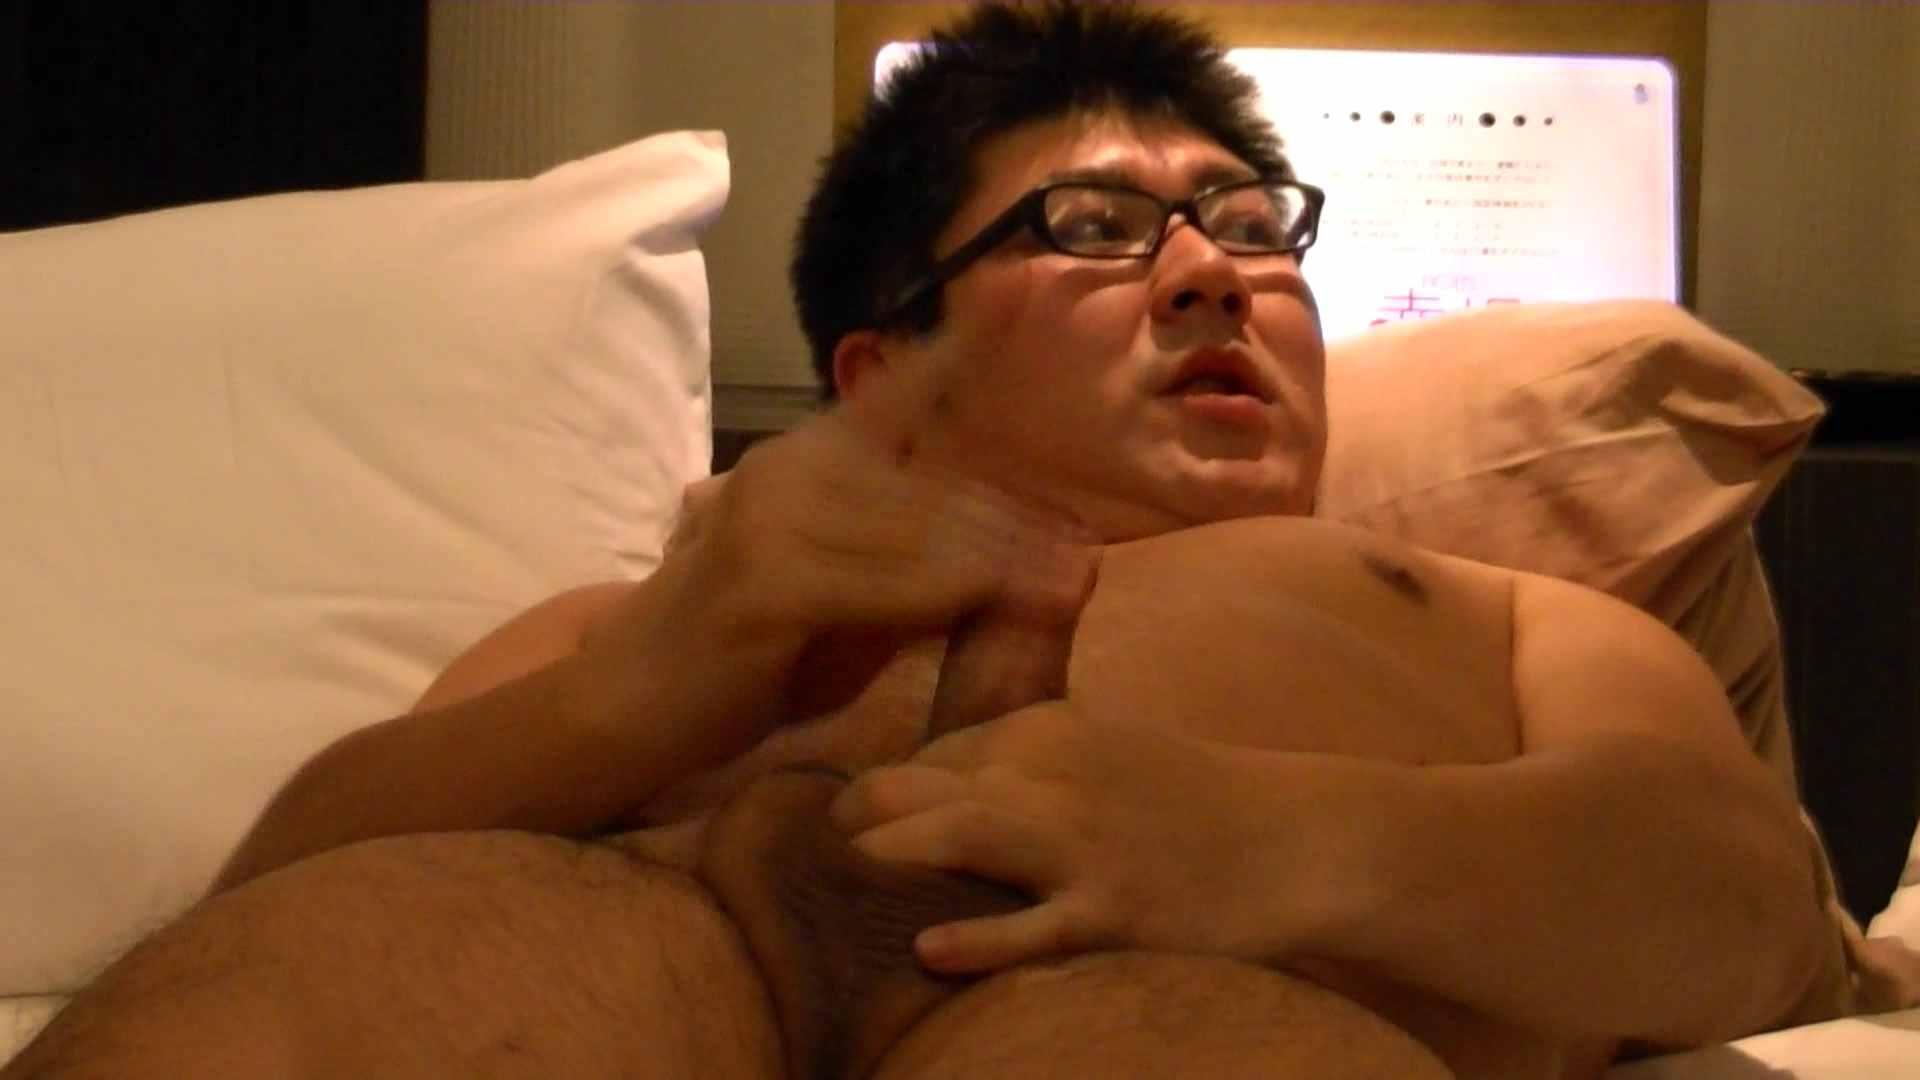 Mr.オナックスさん投稿!HD 貴方のオナニー三万円で撮影させてください。VOL.03 後編 投稿 ゲイ無修正ビデオ画像 106枚 15